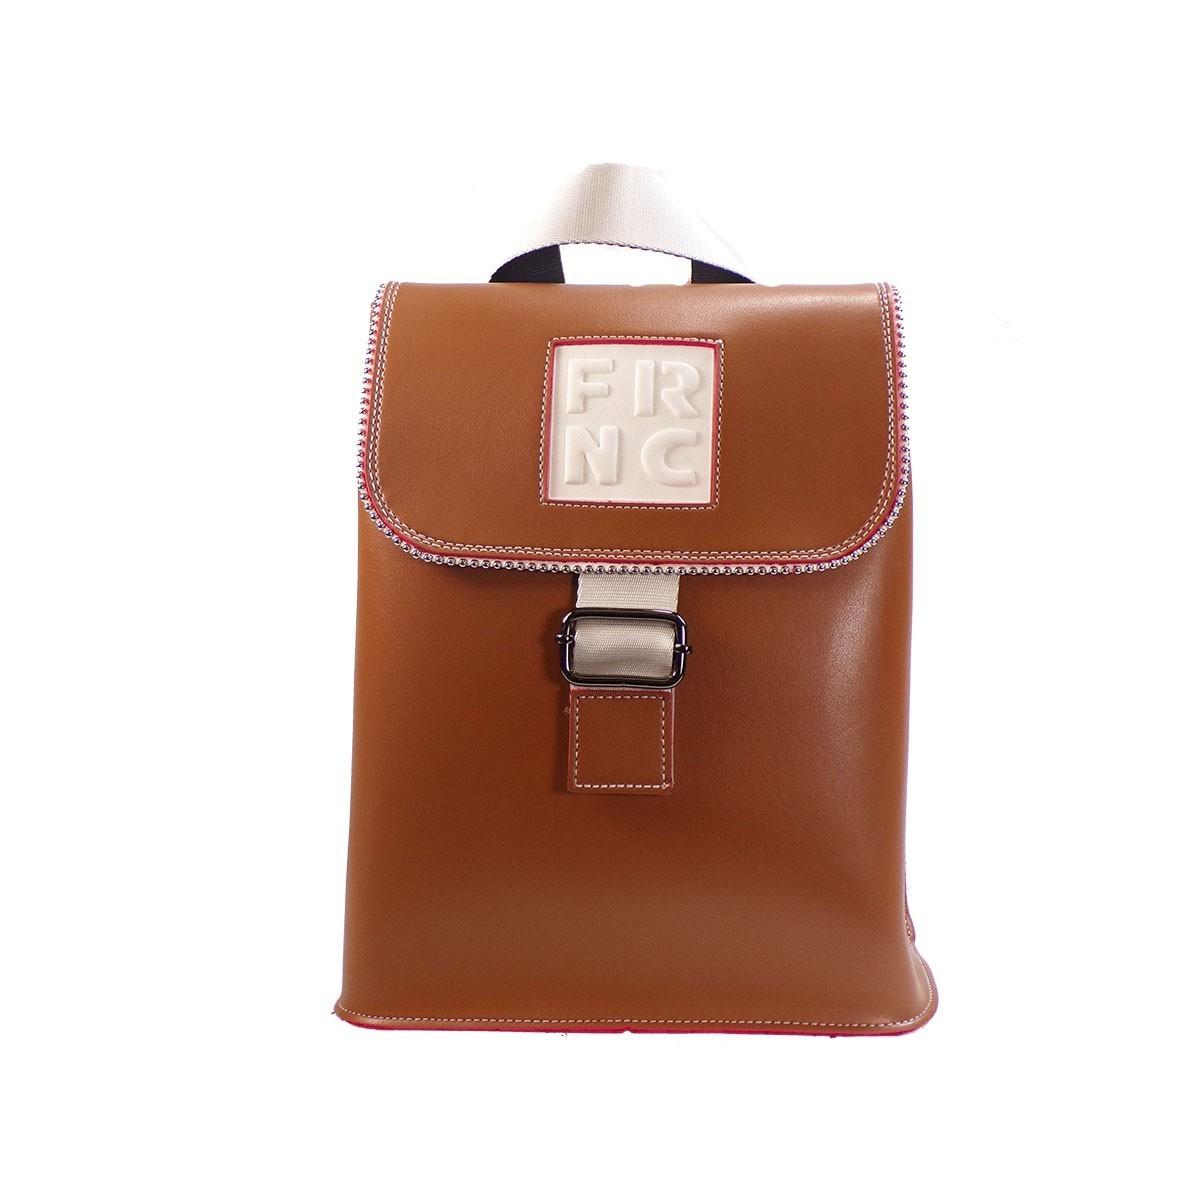 c399b41897 FRNC FRANCESCO Τσάντα Γυναικεία Πλάτης-Backpack 1260 Ταμπά Δέρμα ...